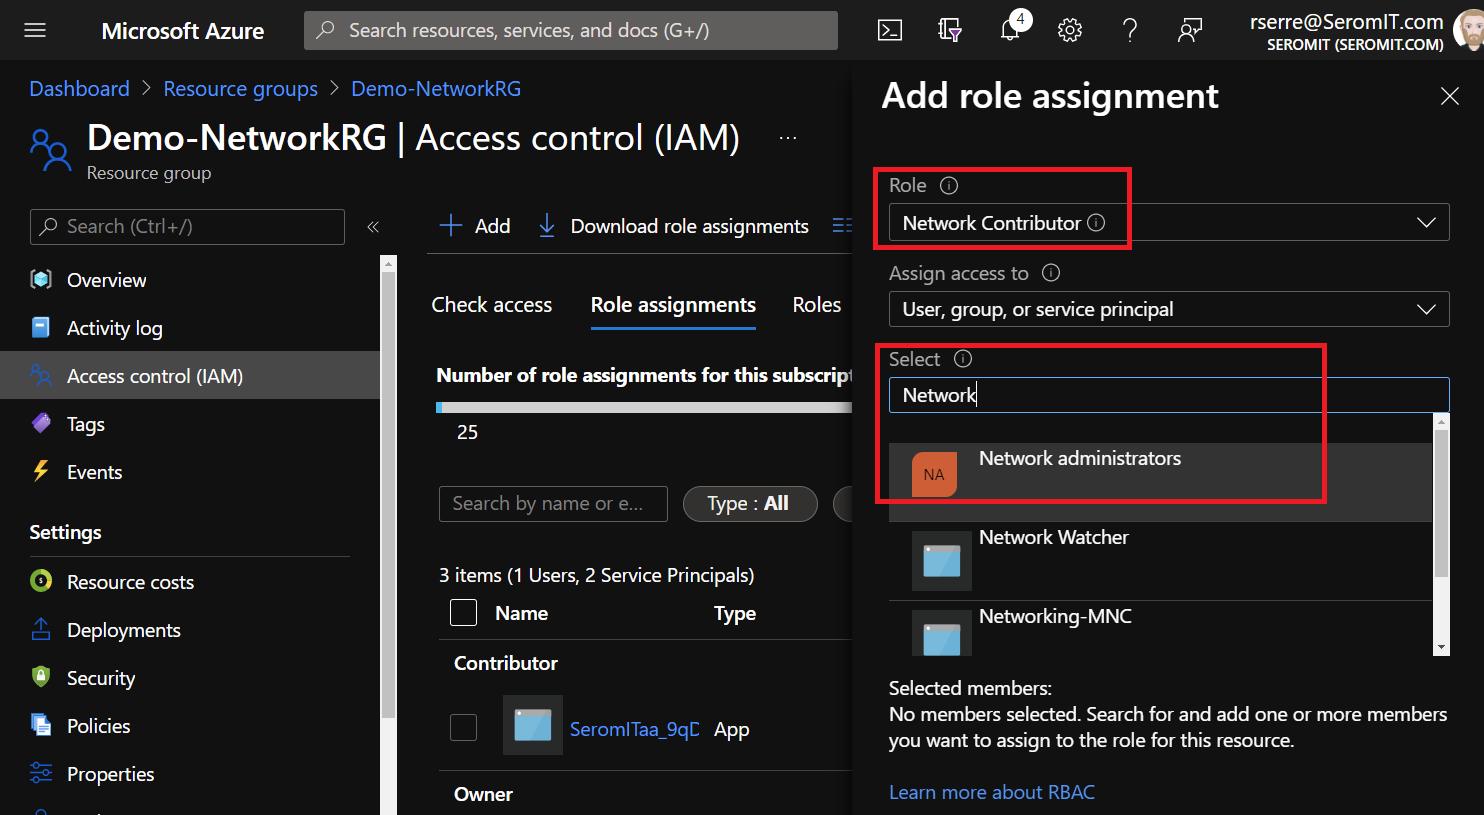 Microsoft Azure - Network Contributor